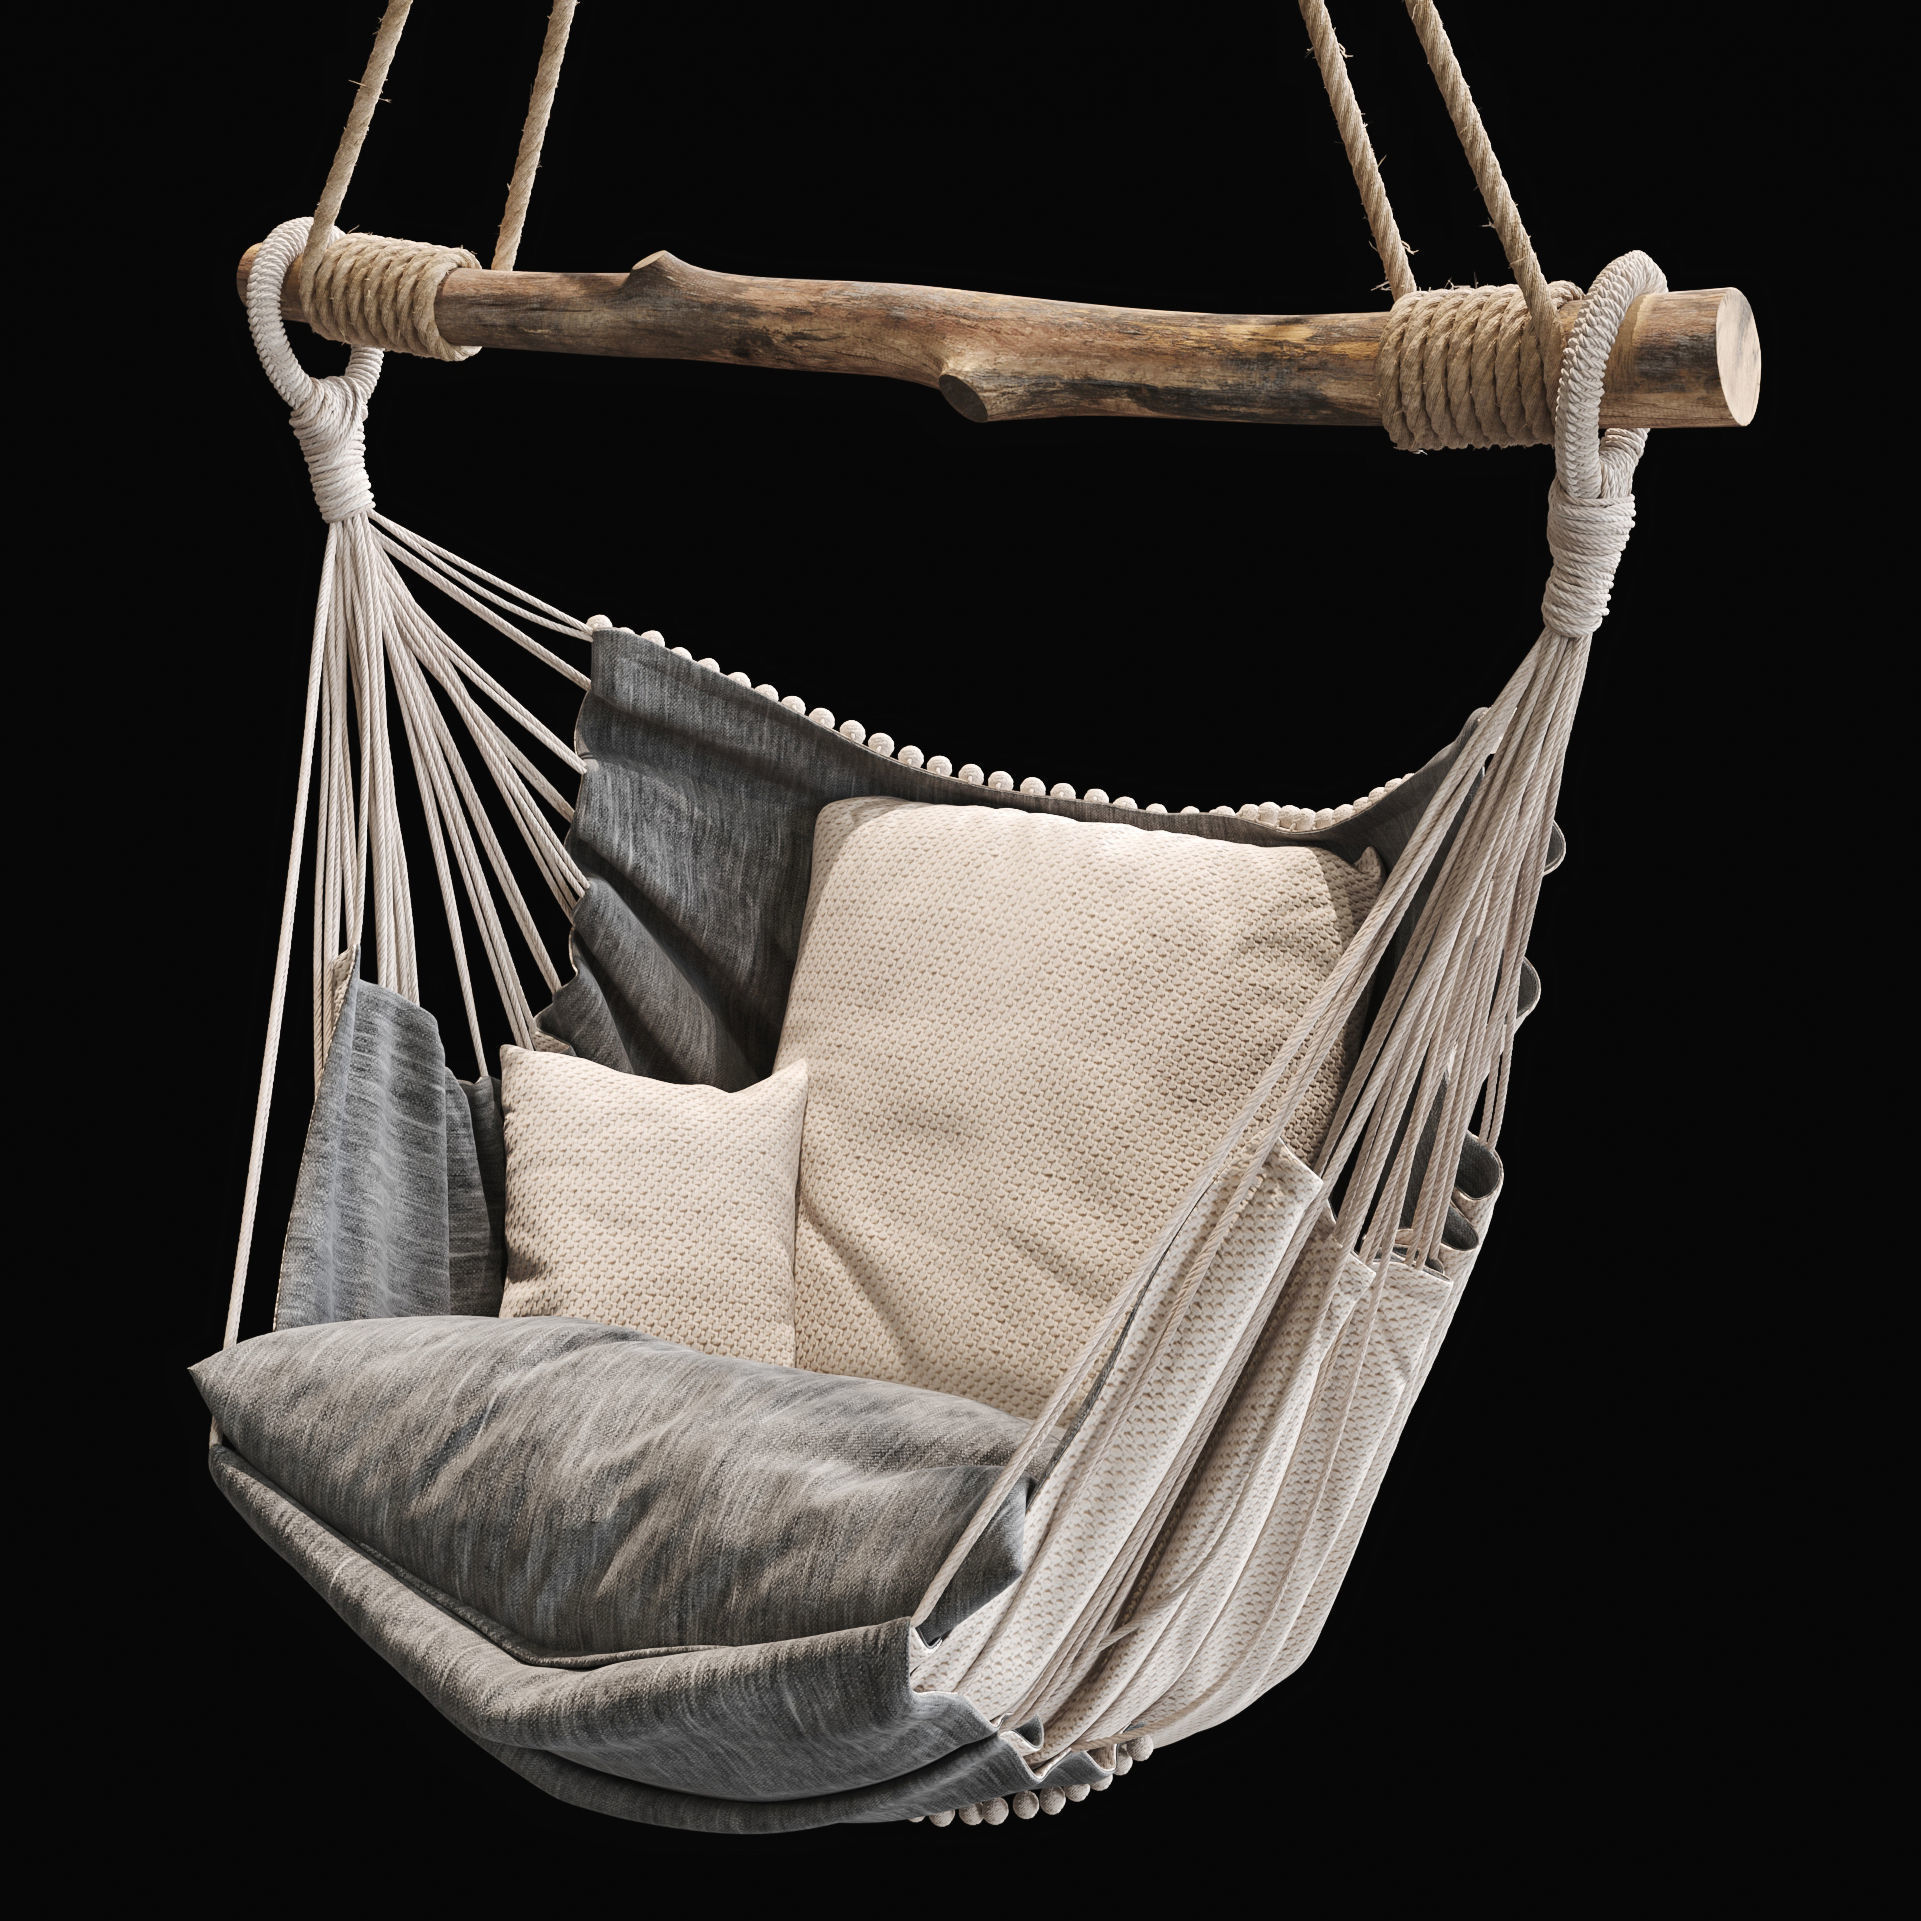 3d Hanging Hammock Chair 2 Cgtrader